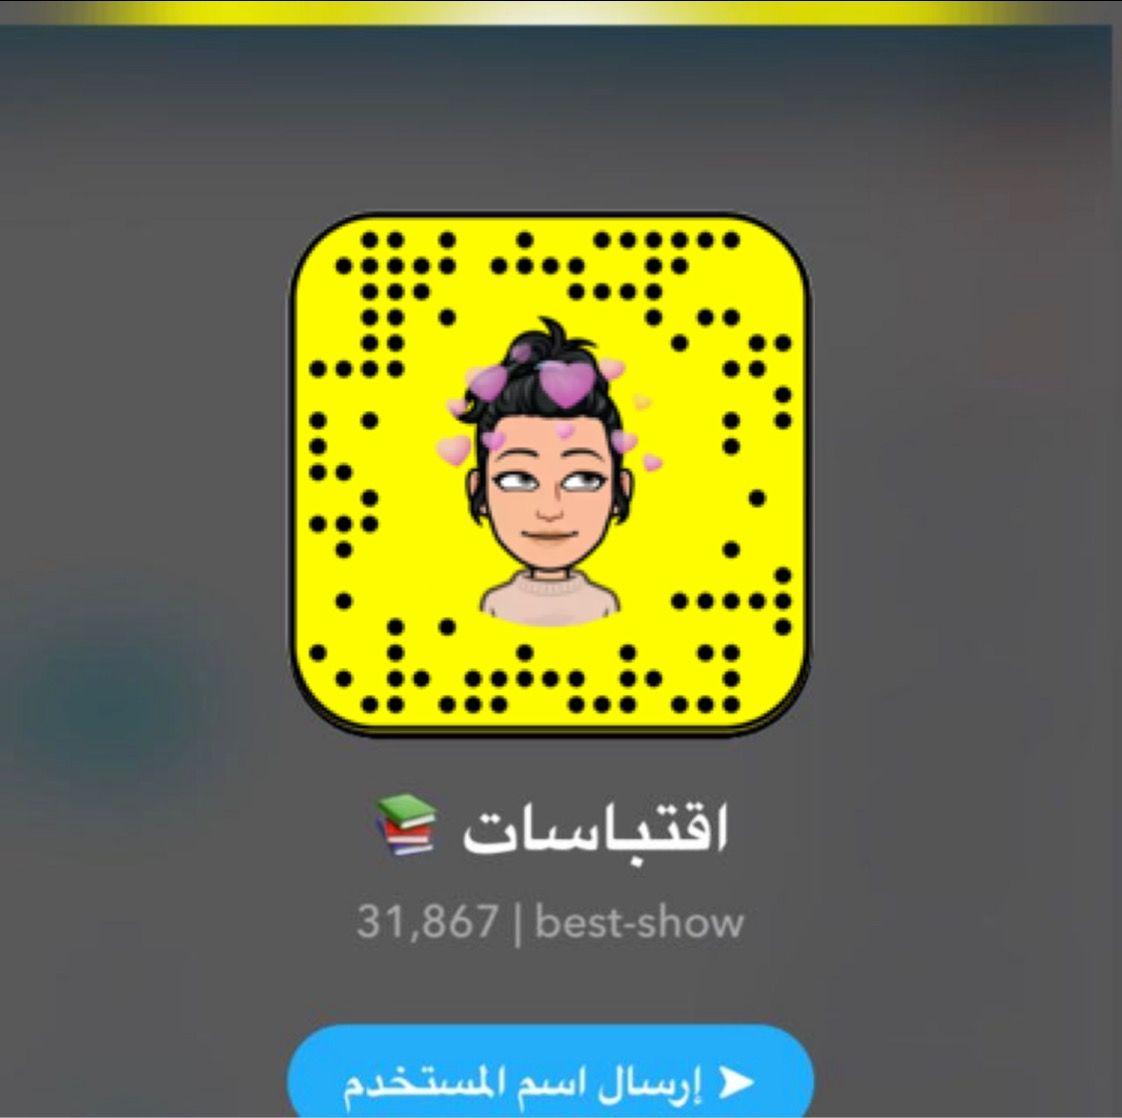 سنابات سناب شات Snapchat Screenshot Snapchat Best